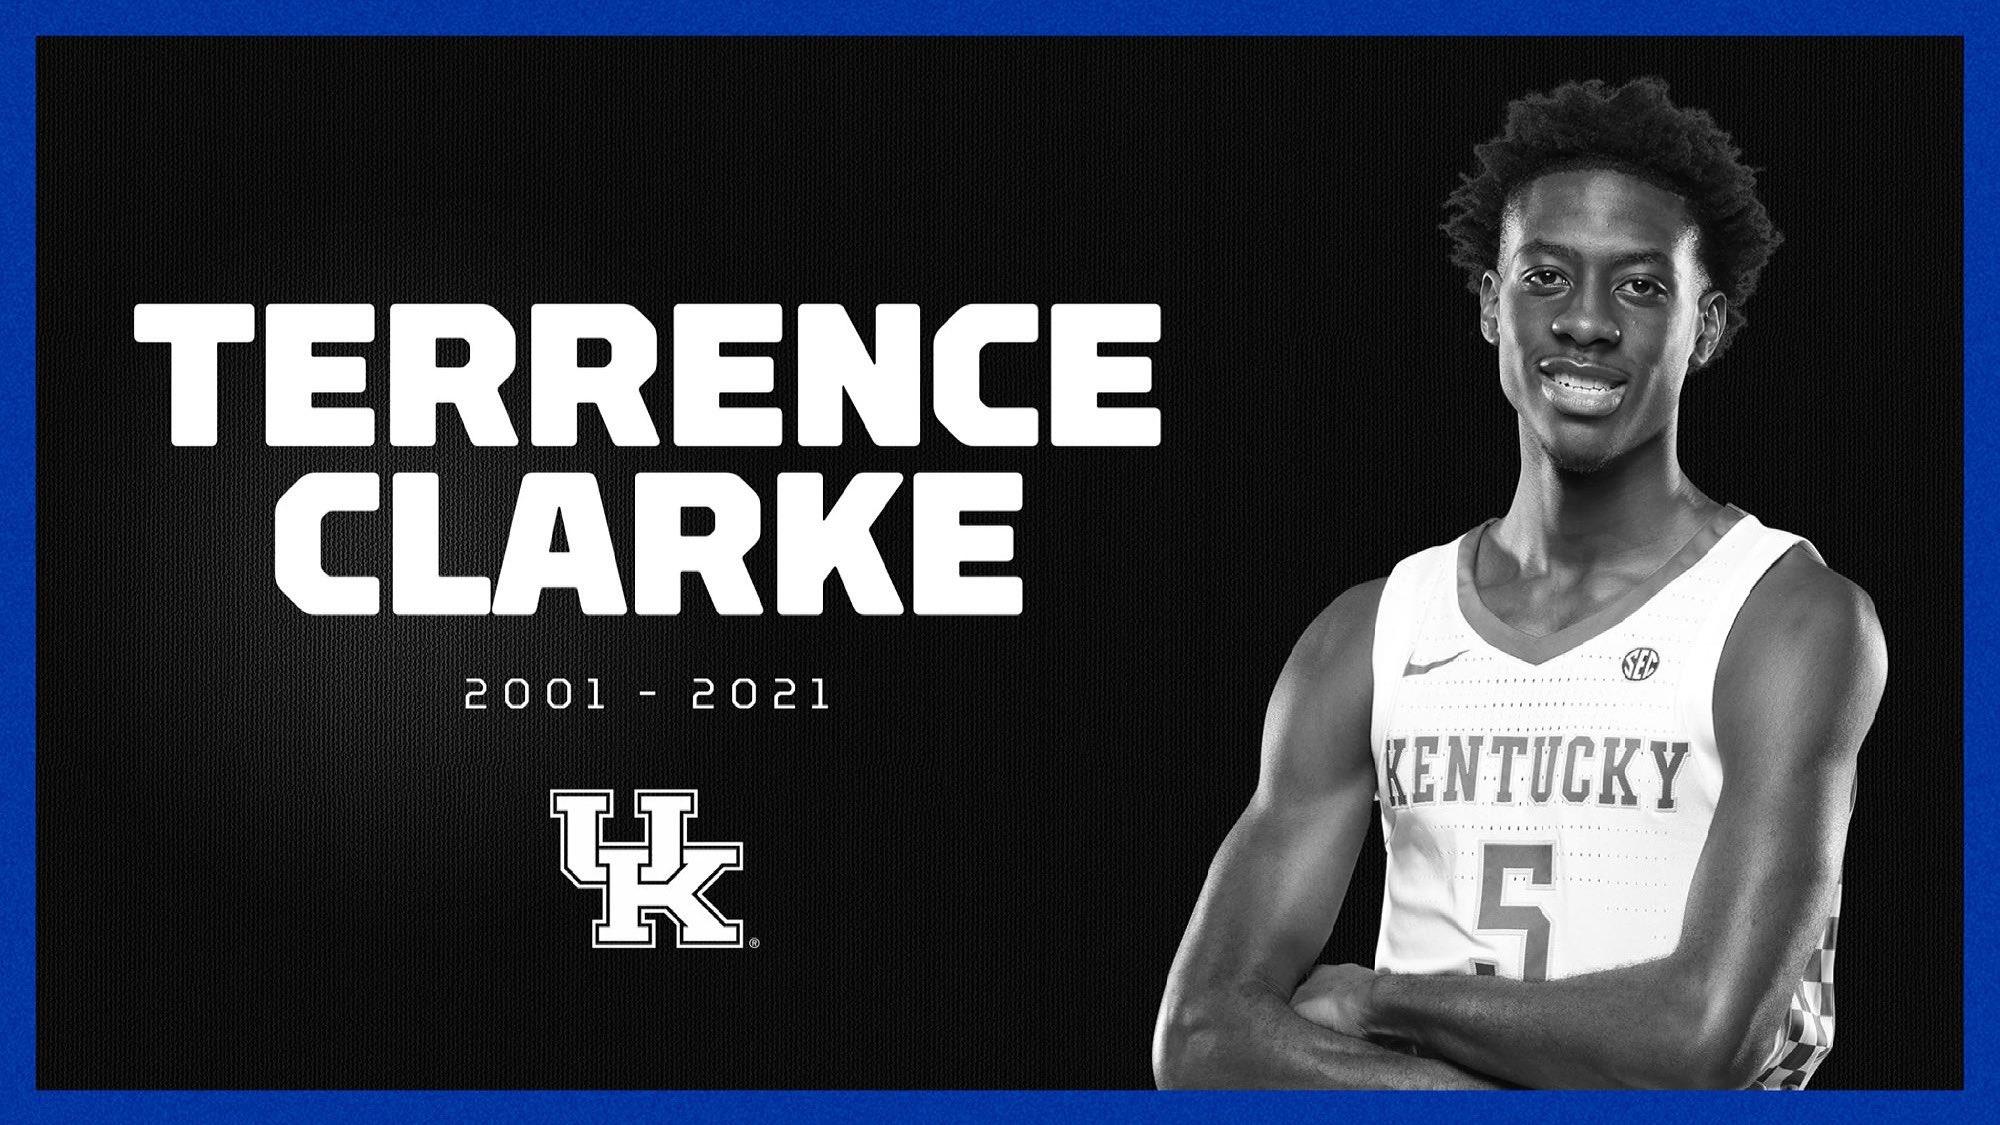 Tragedia in NCAA, un incidente d'auto si porta via Terrence Clarke